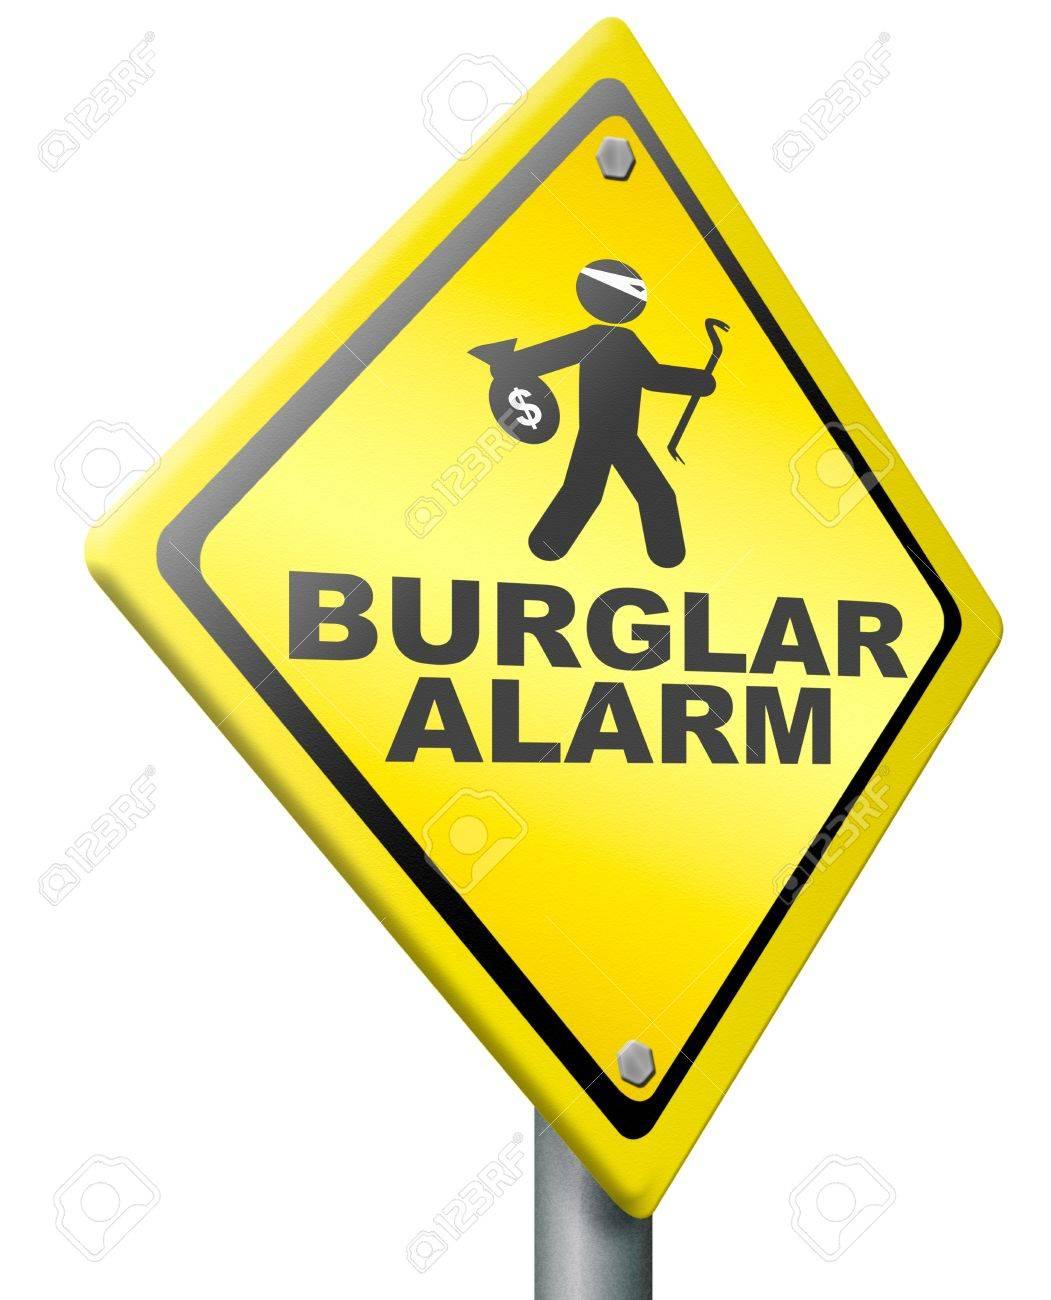 burglar alarm prevention from burglary and robbery warning sign rh 123rf com Home Alarm Systems Burglar Alarm Circuit